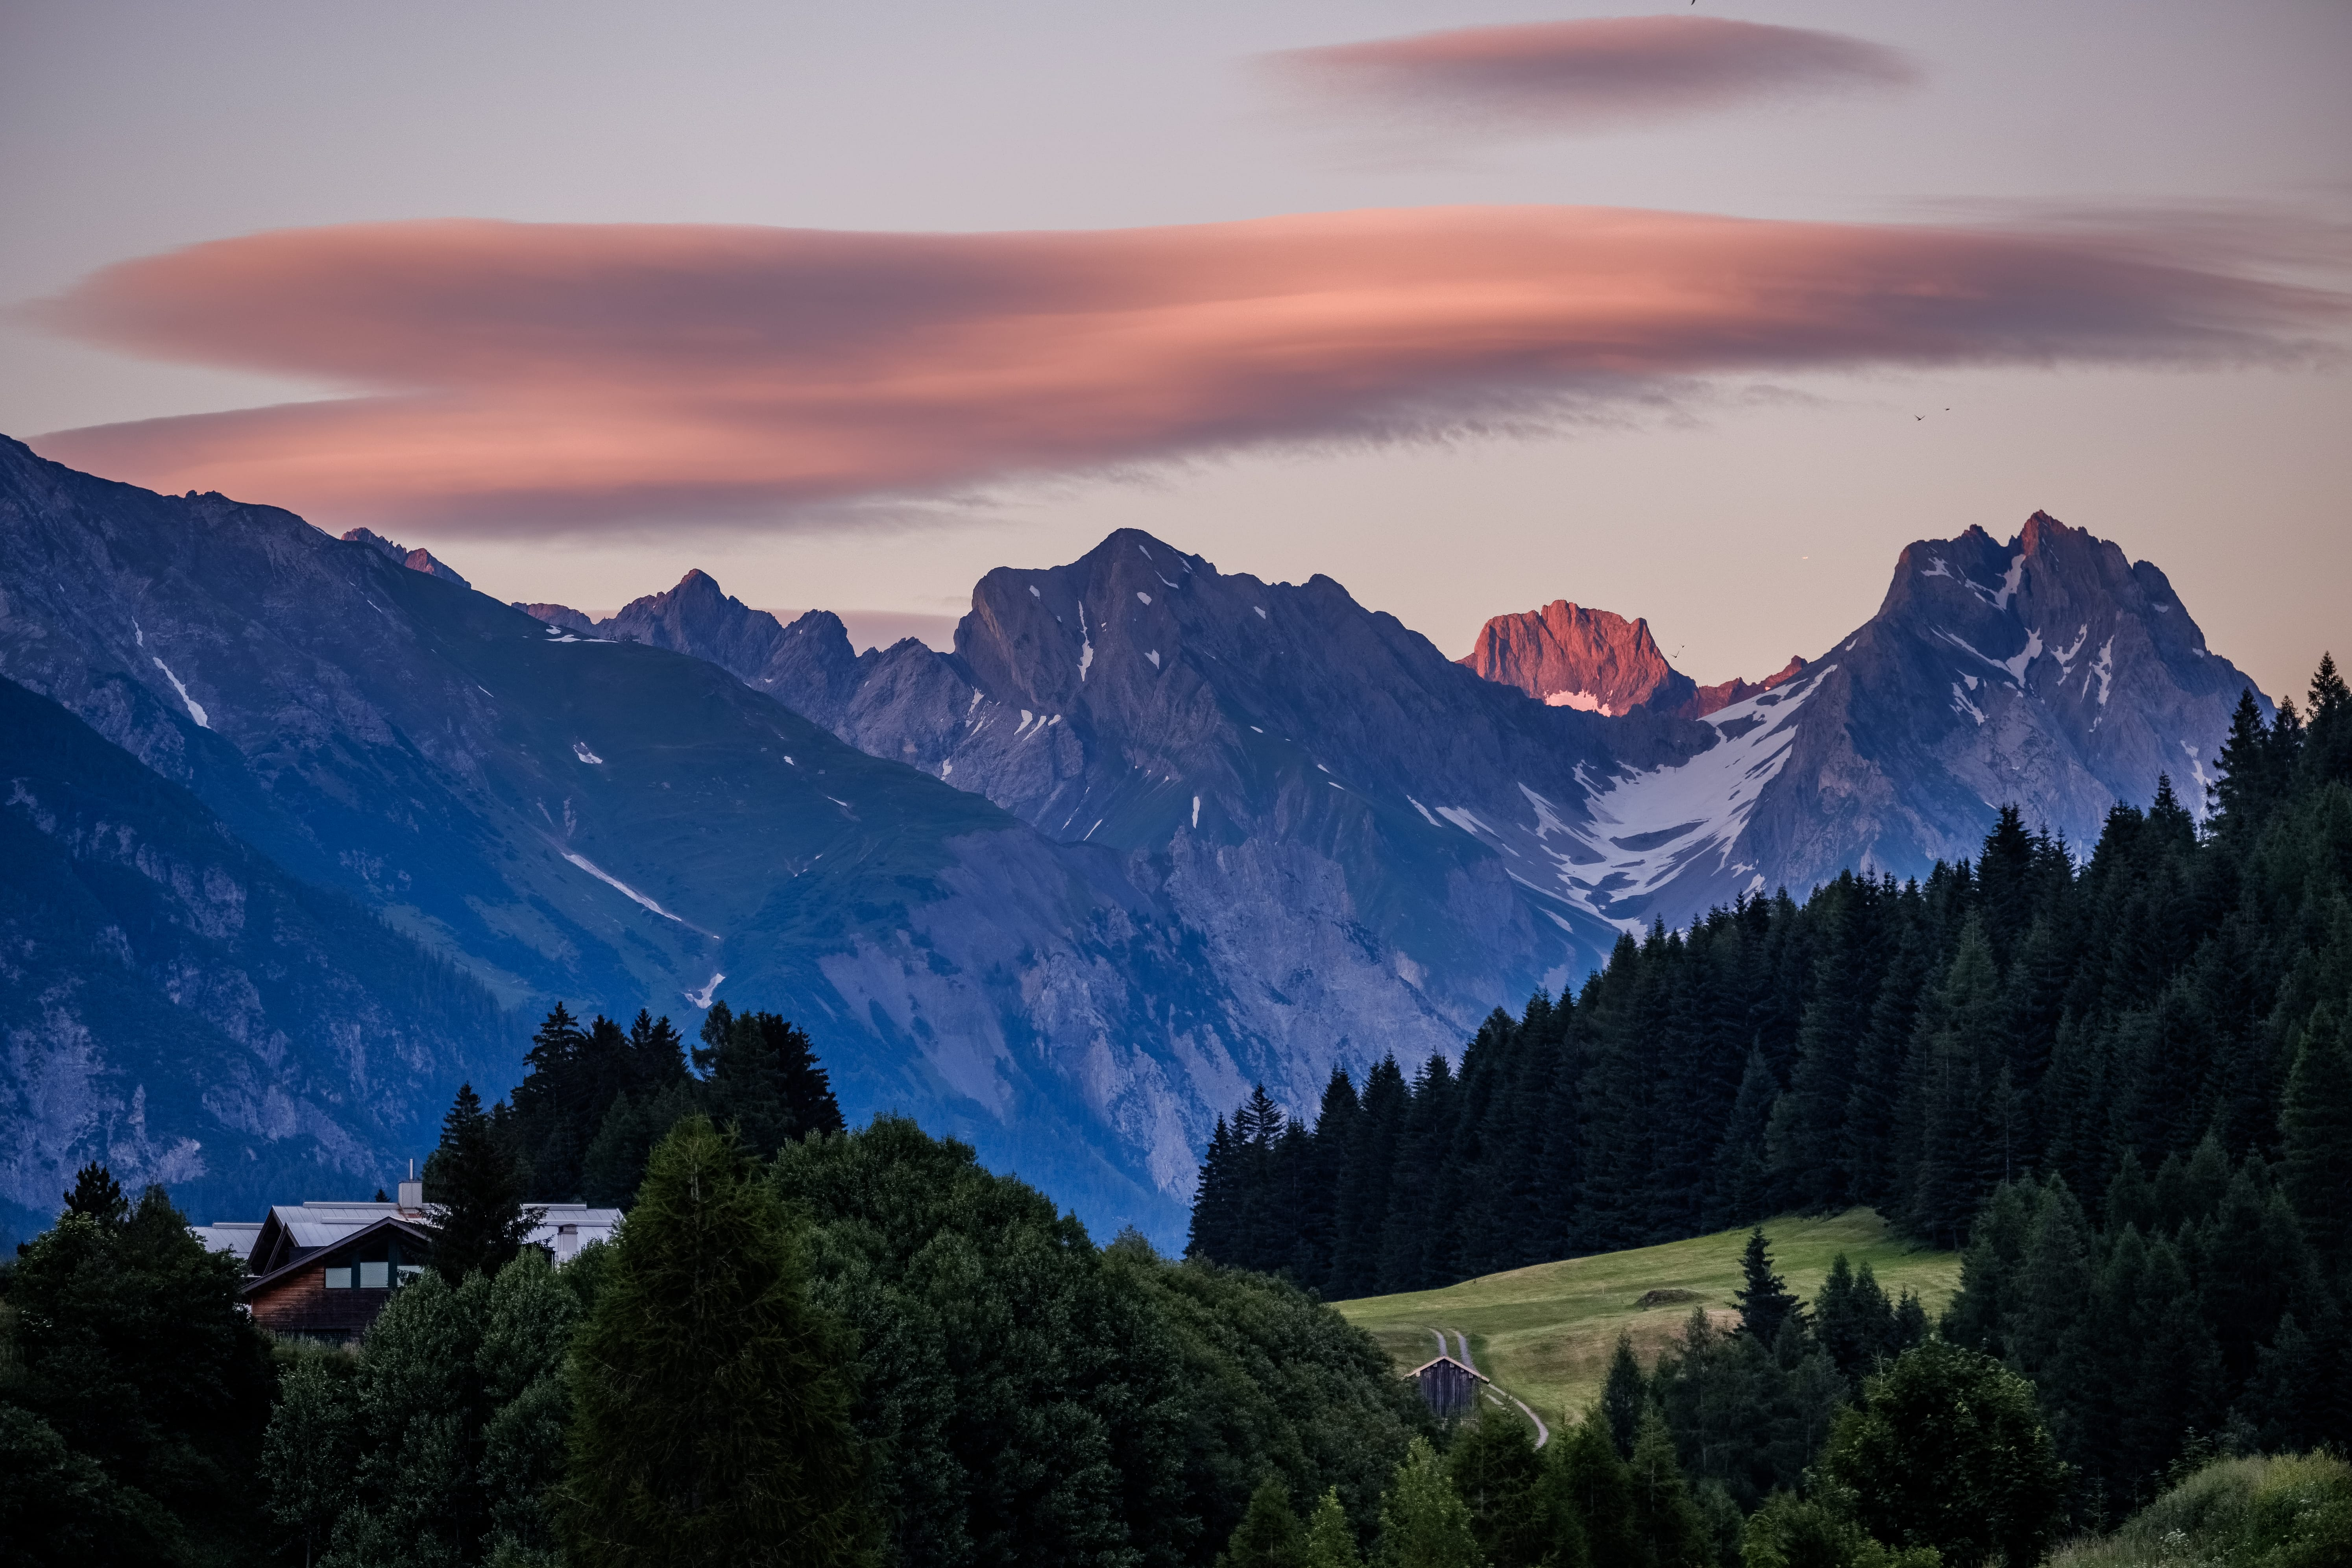 St Moritz, Austria